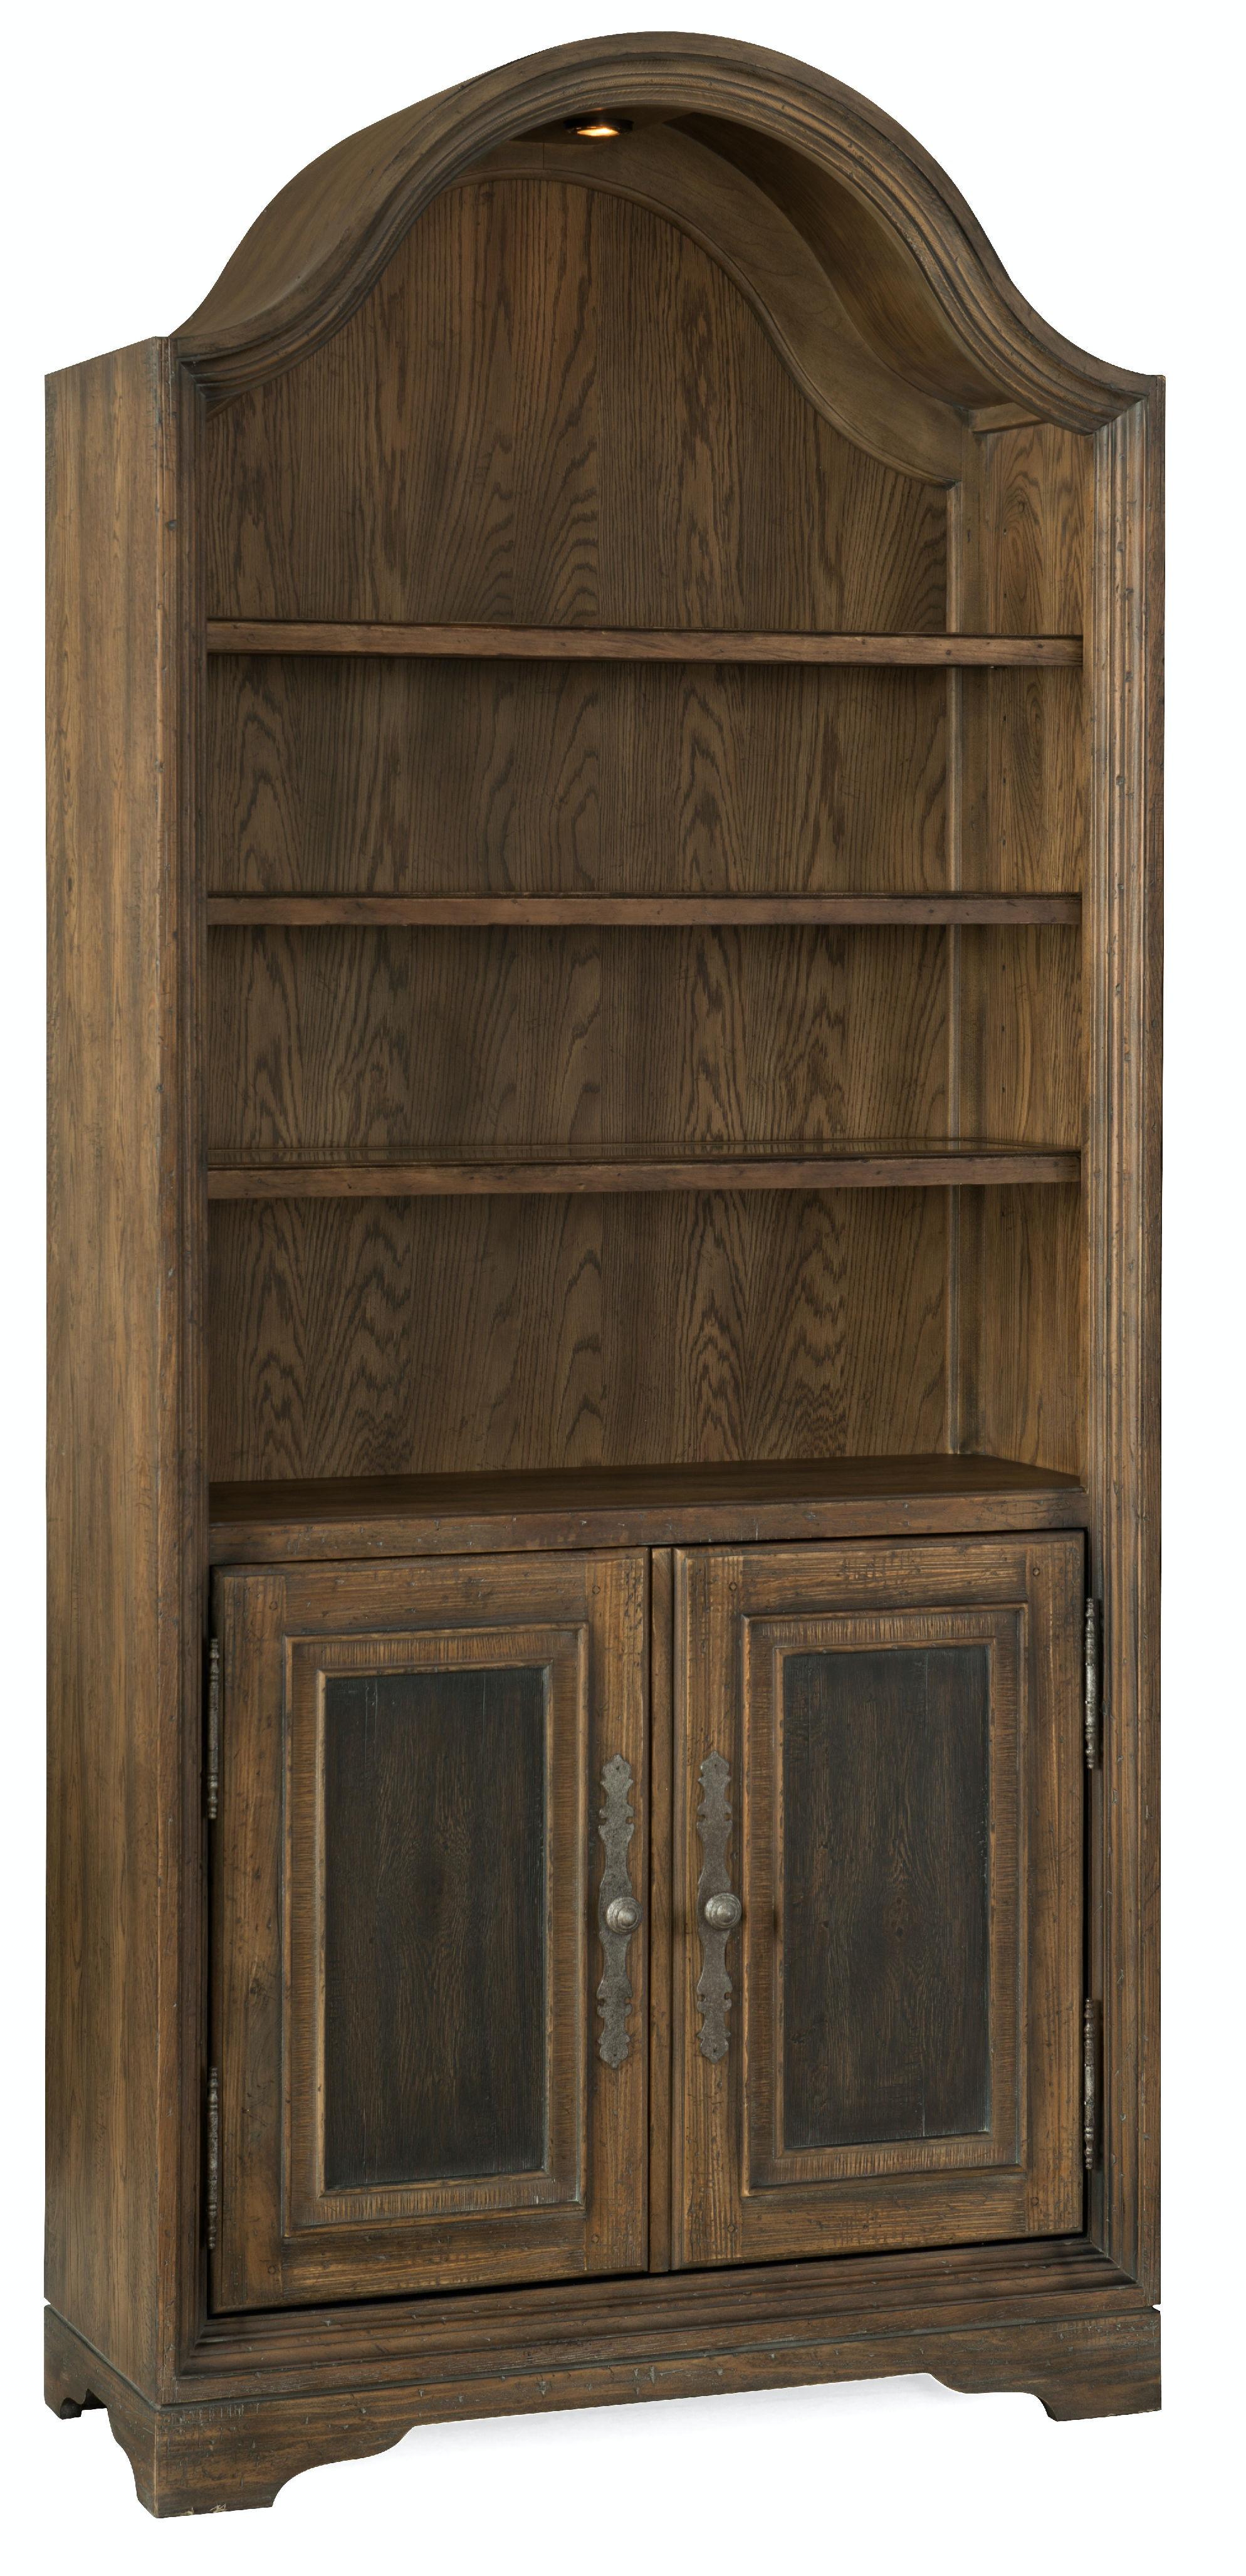 Pleasanton Bunching Bookcase 5960-10446-MULTI